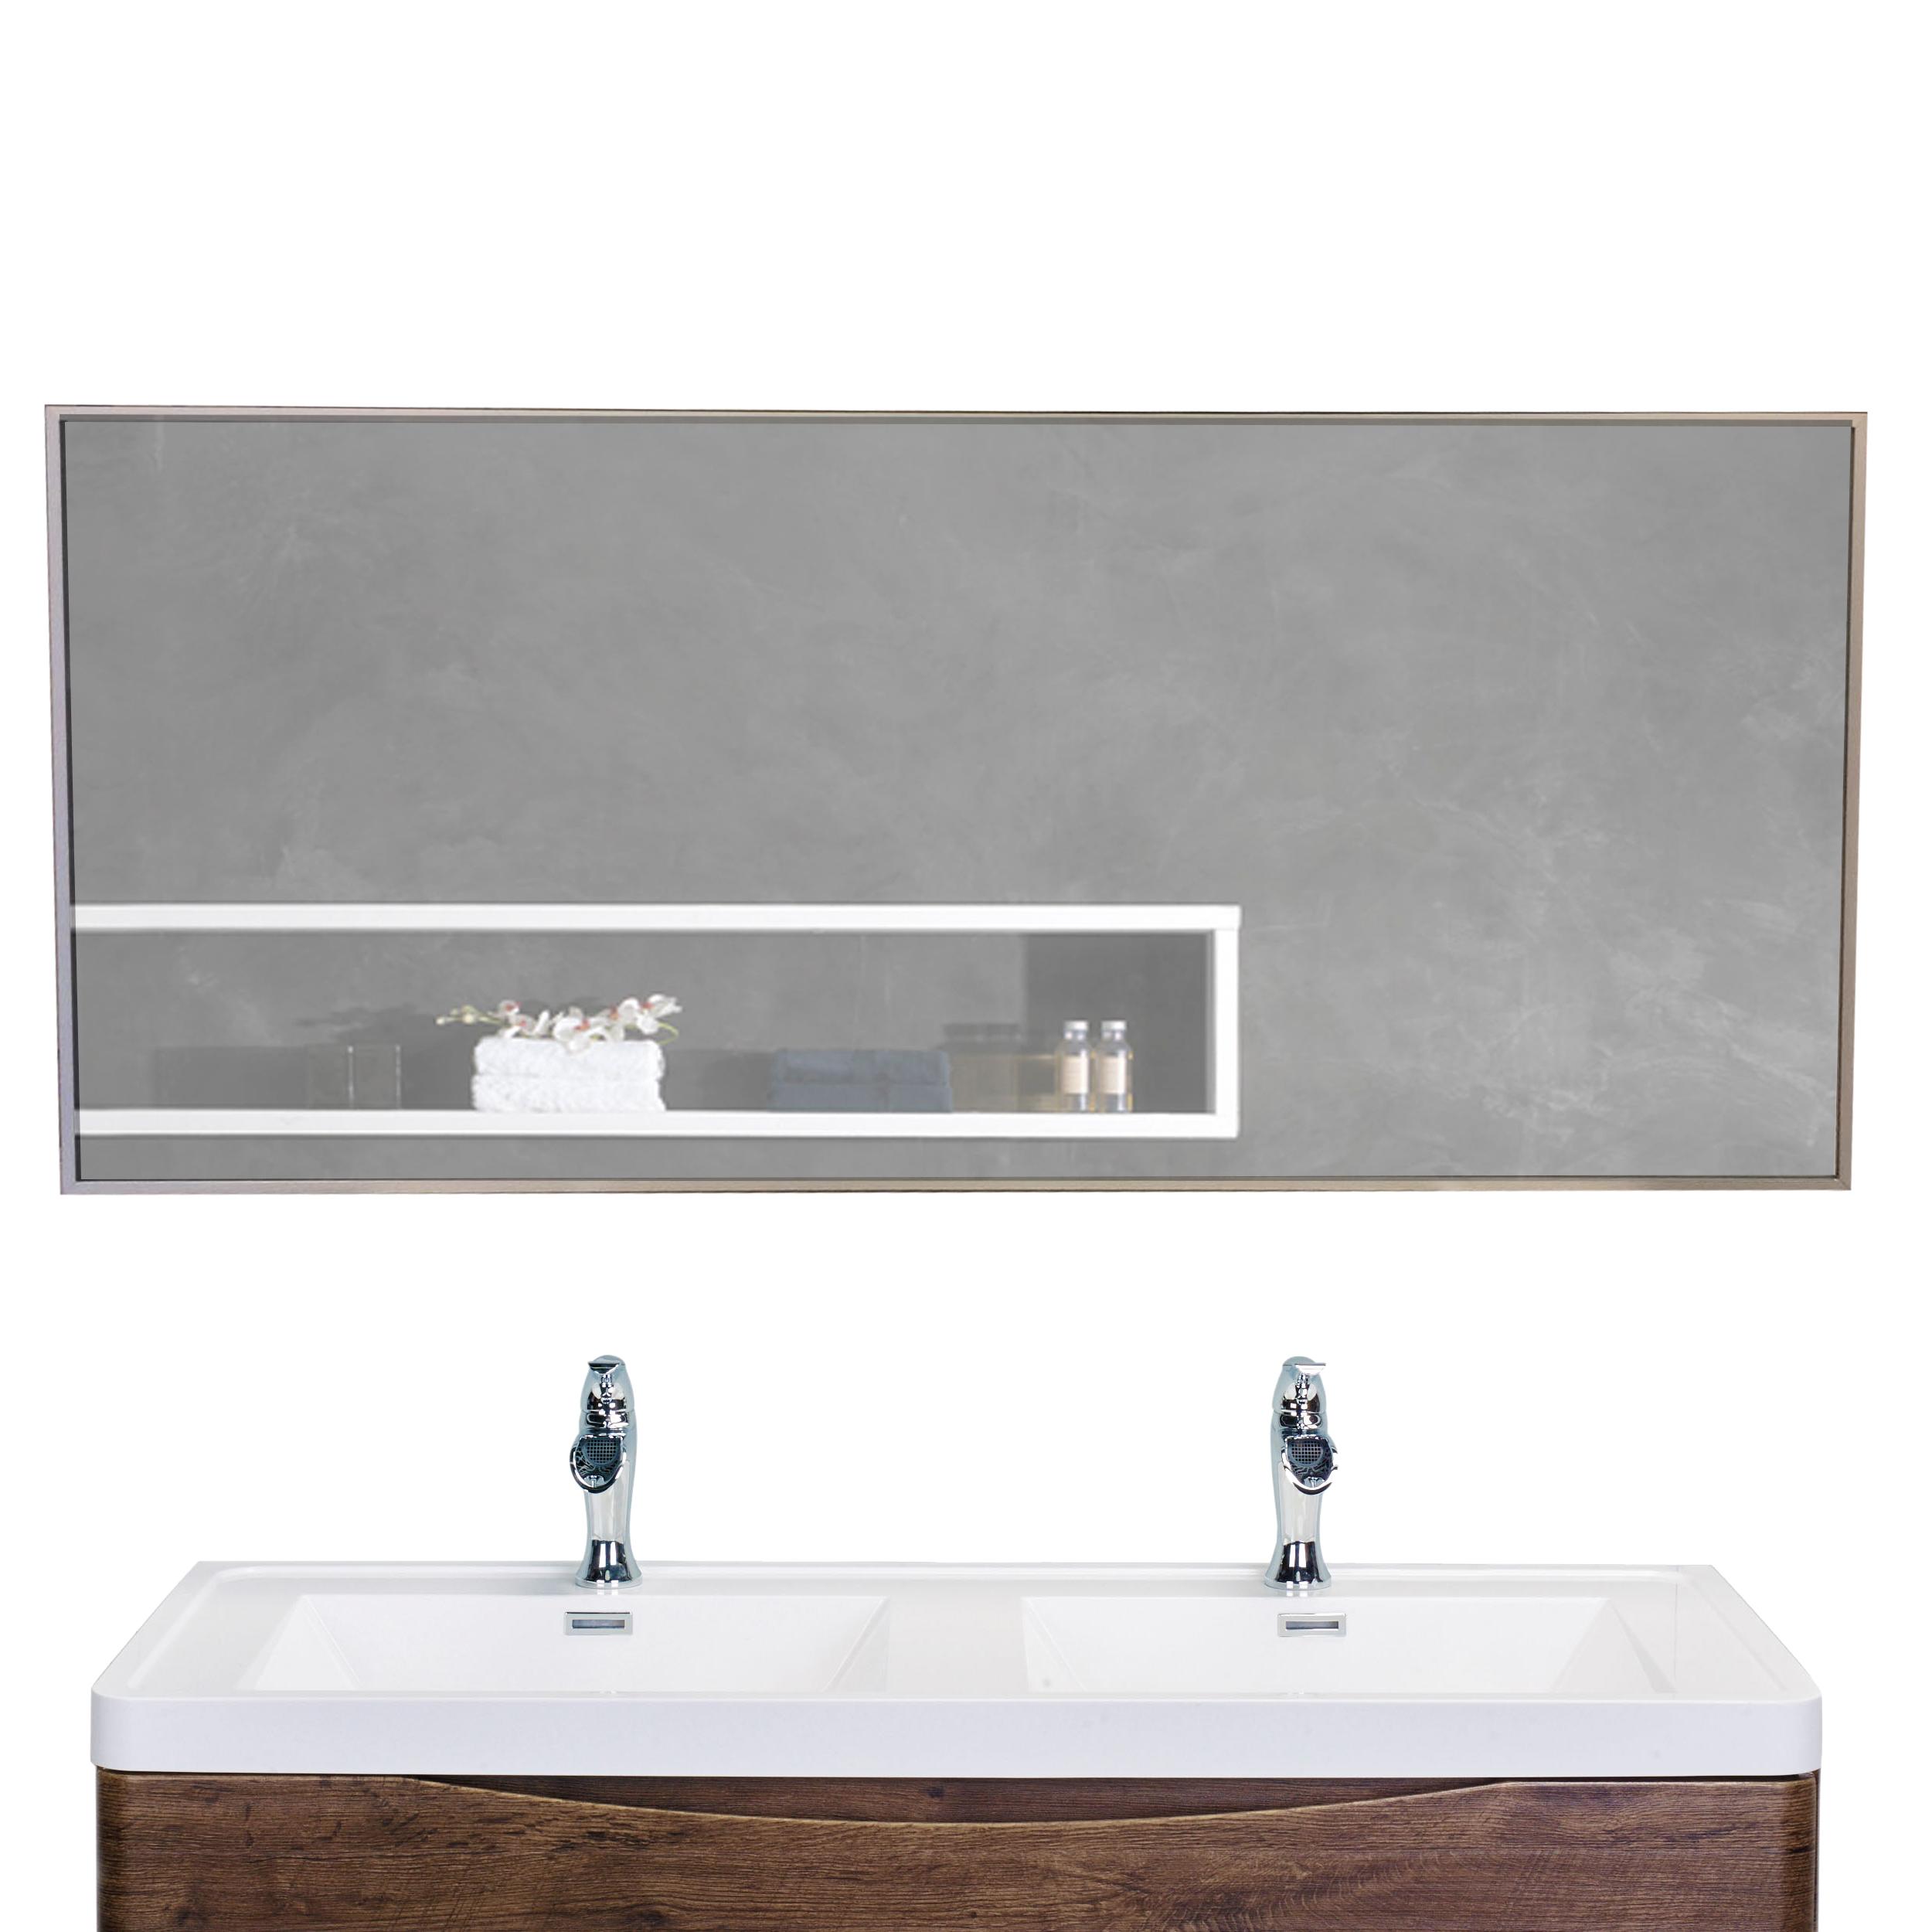 EVMR01 57X20 MetalFrame A Main - Eviva Sax 57X20 Brushed Metal Frame Bathroom Wall Mirror